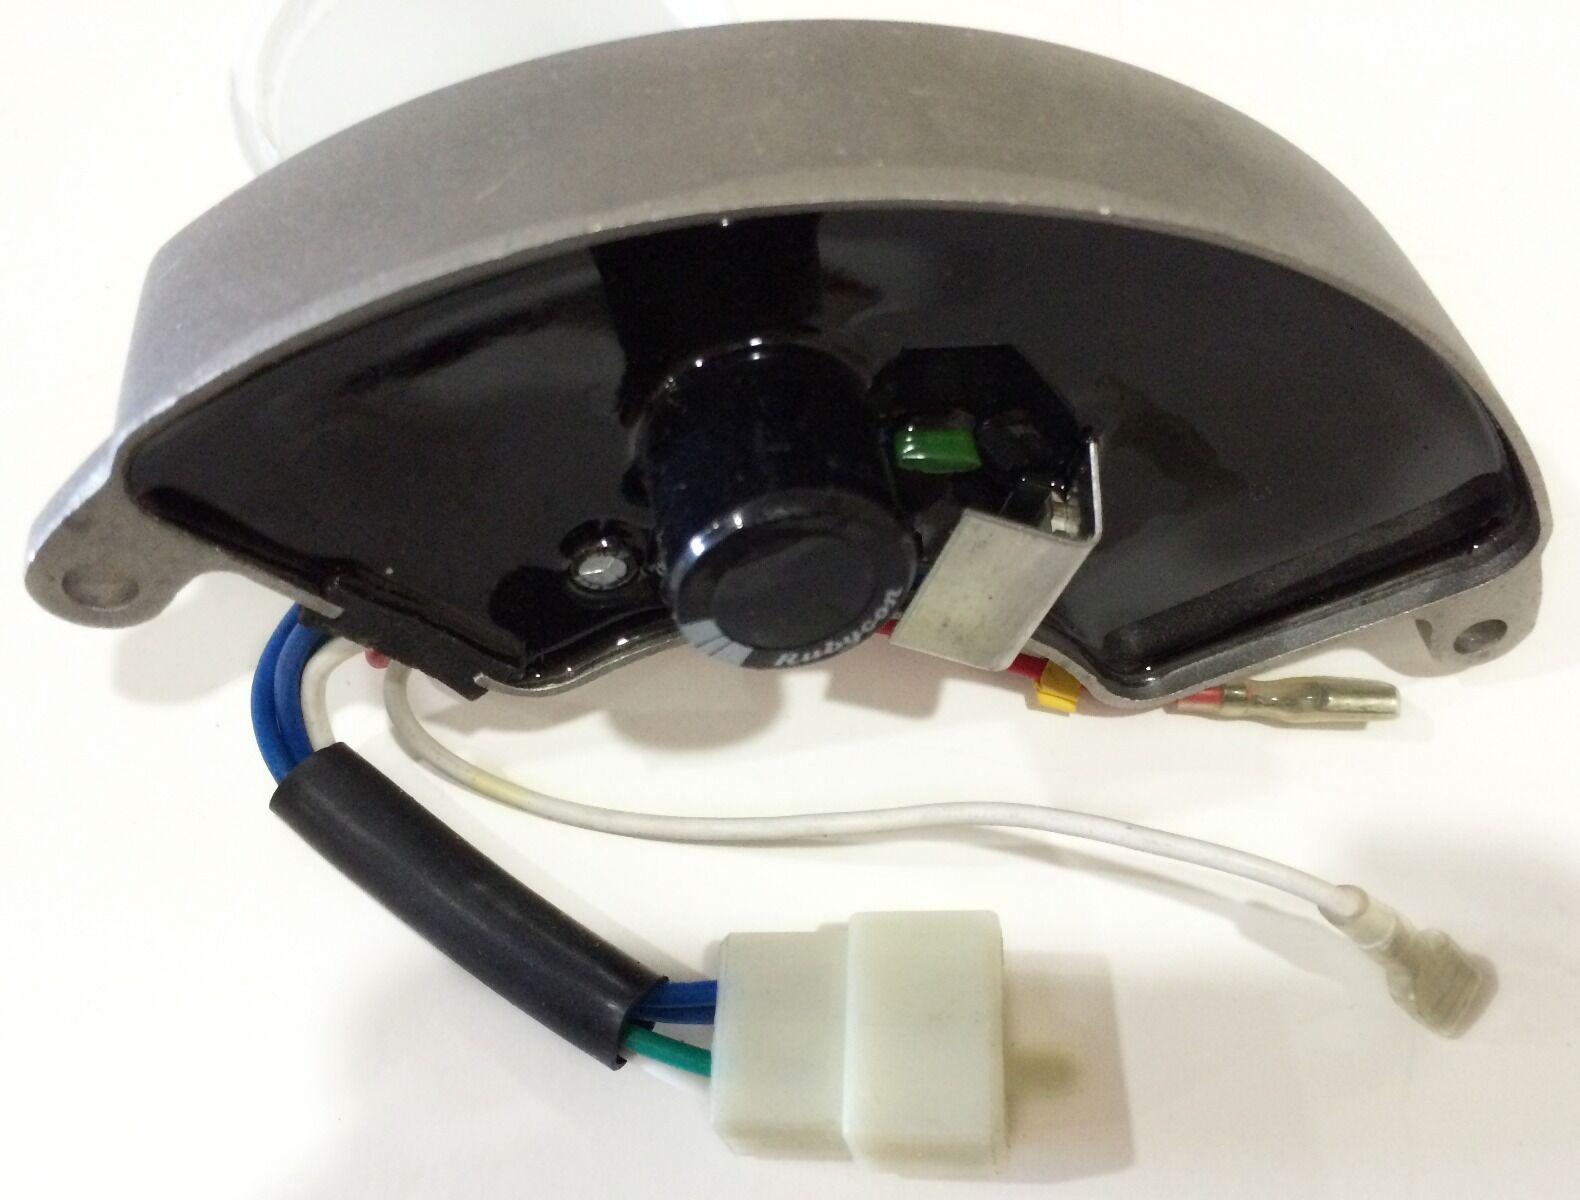 CHAMPION STYLE ROCKER ARM ASSEMBLY fits 337cc fits models 41111 6000 Watt